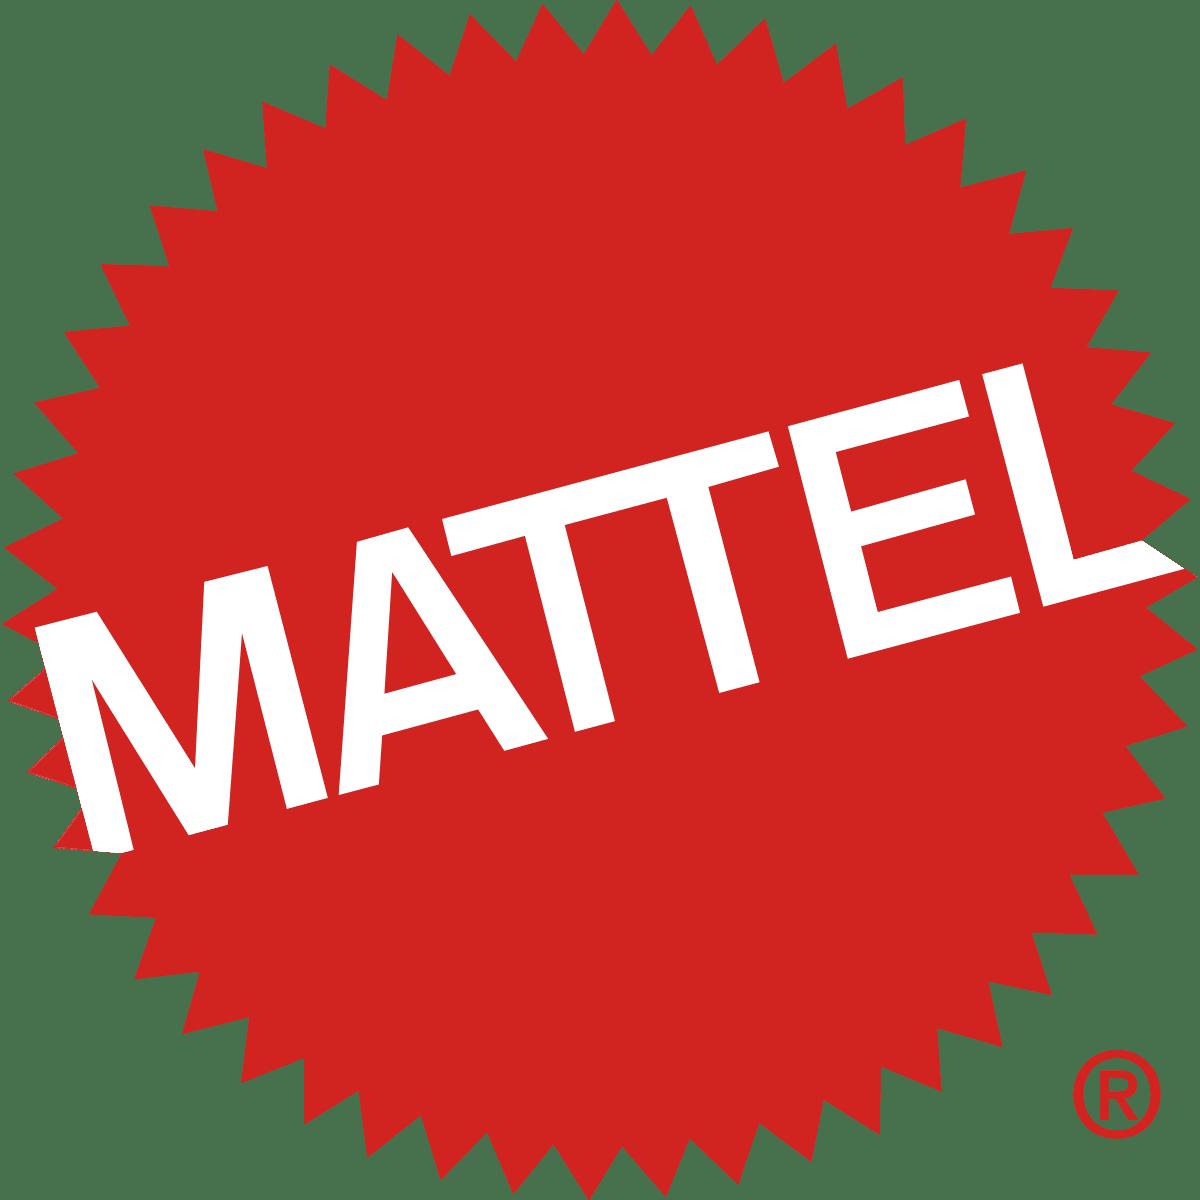 https://www.pneumaticconveyingsolutions.com/wp-content/uploads/1200px-Mattel-brand.png